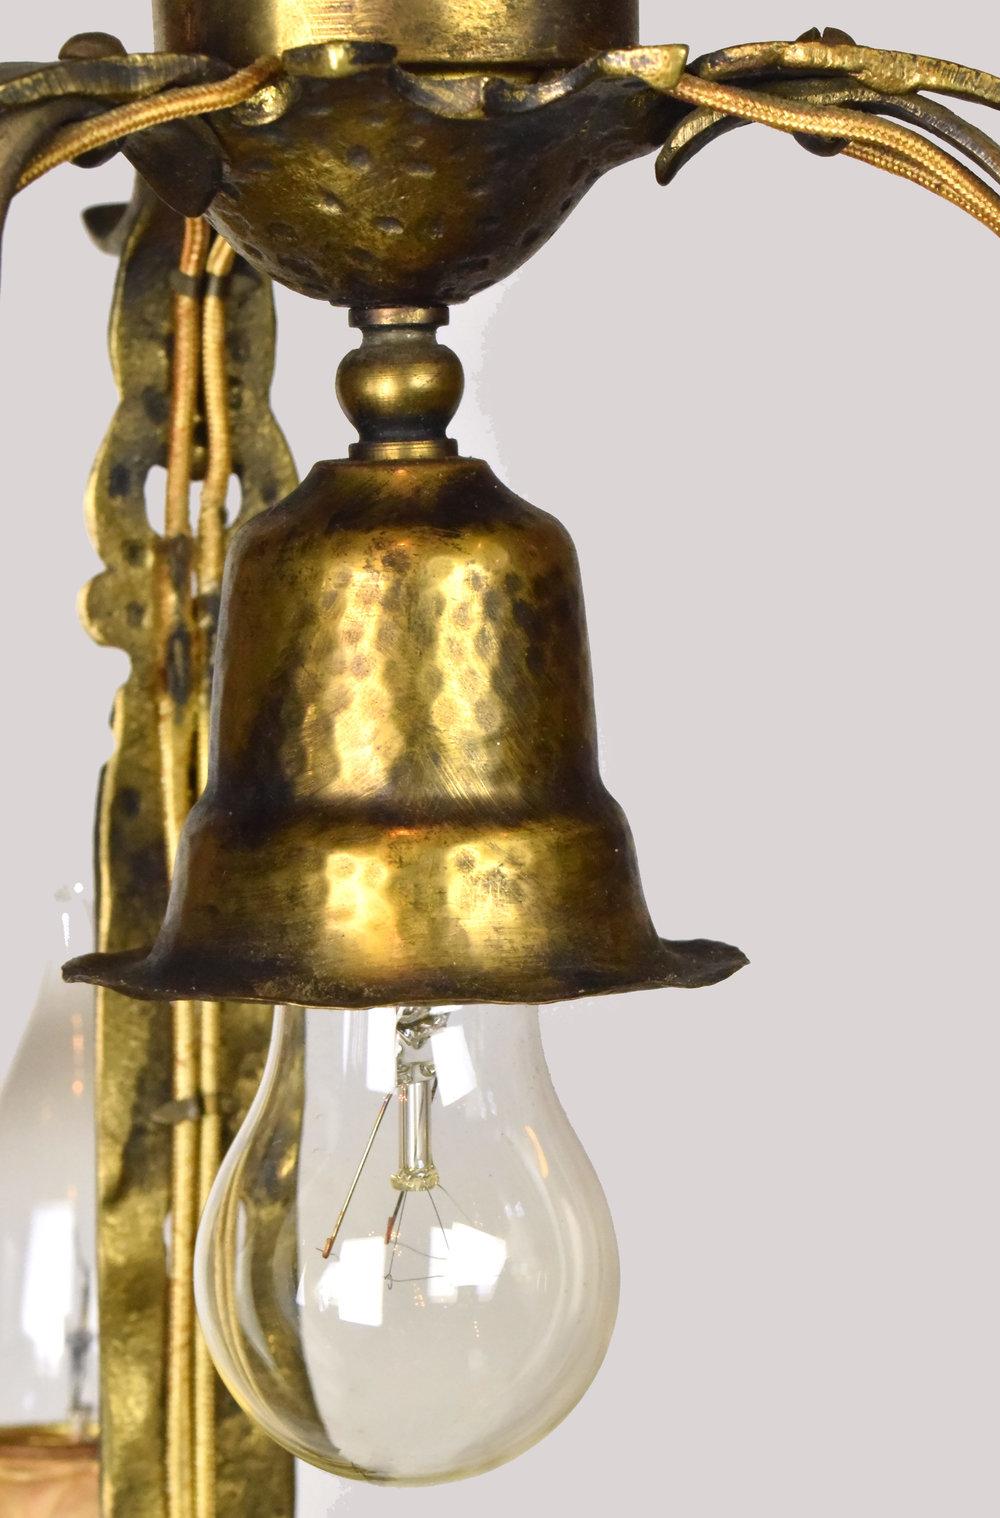 47443-tudor-three-candle-pendant-bulb.jpg